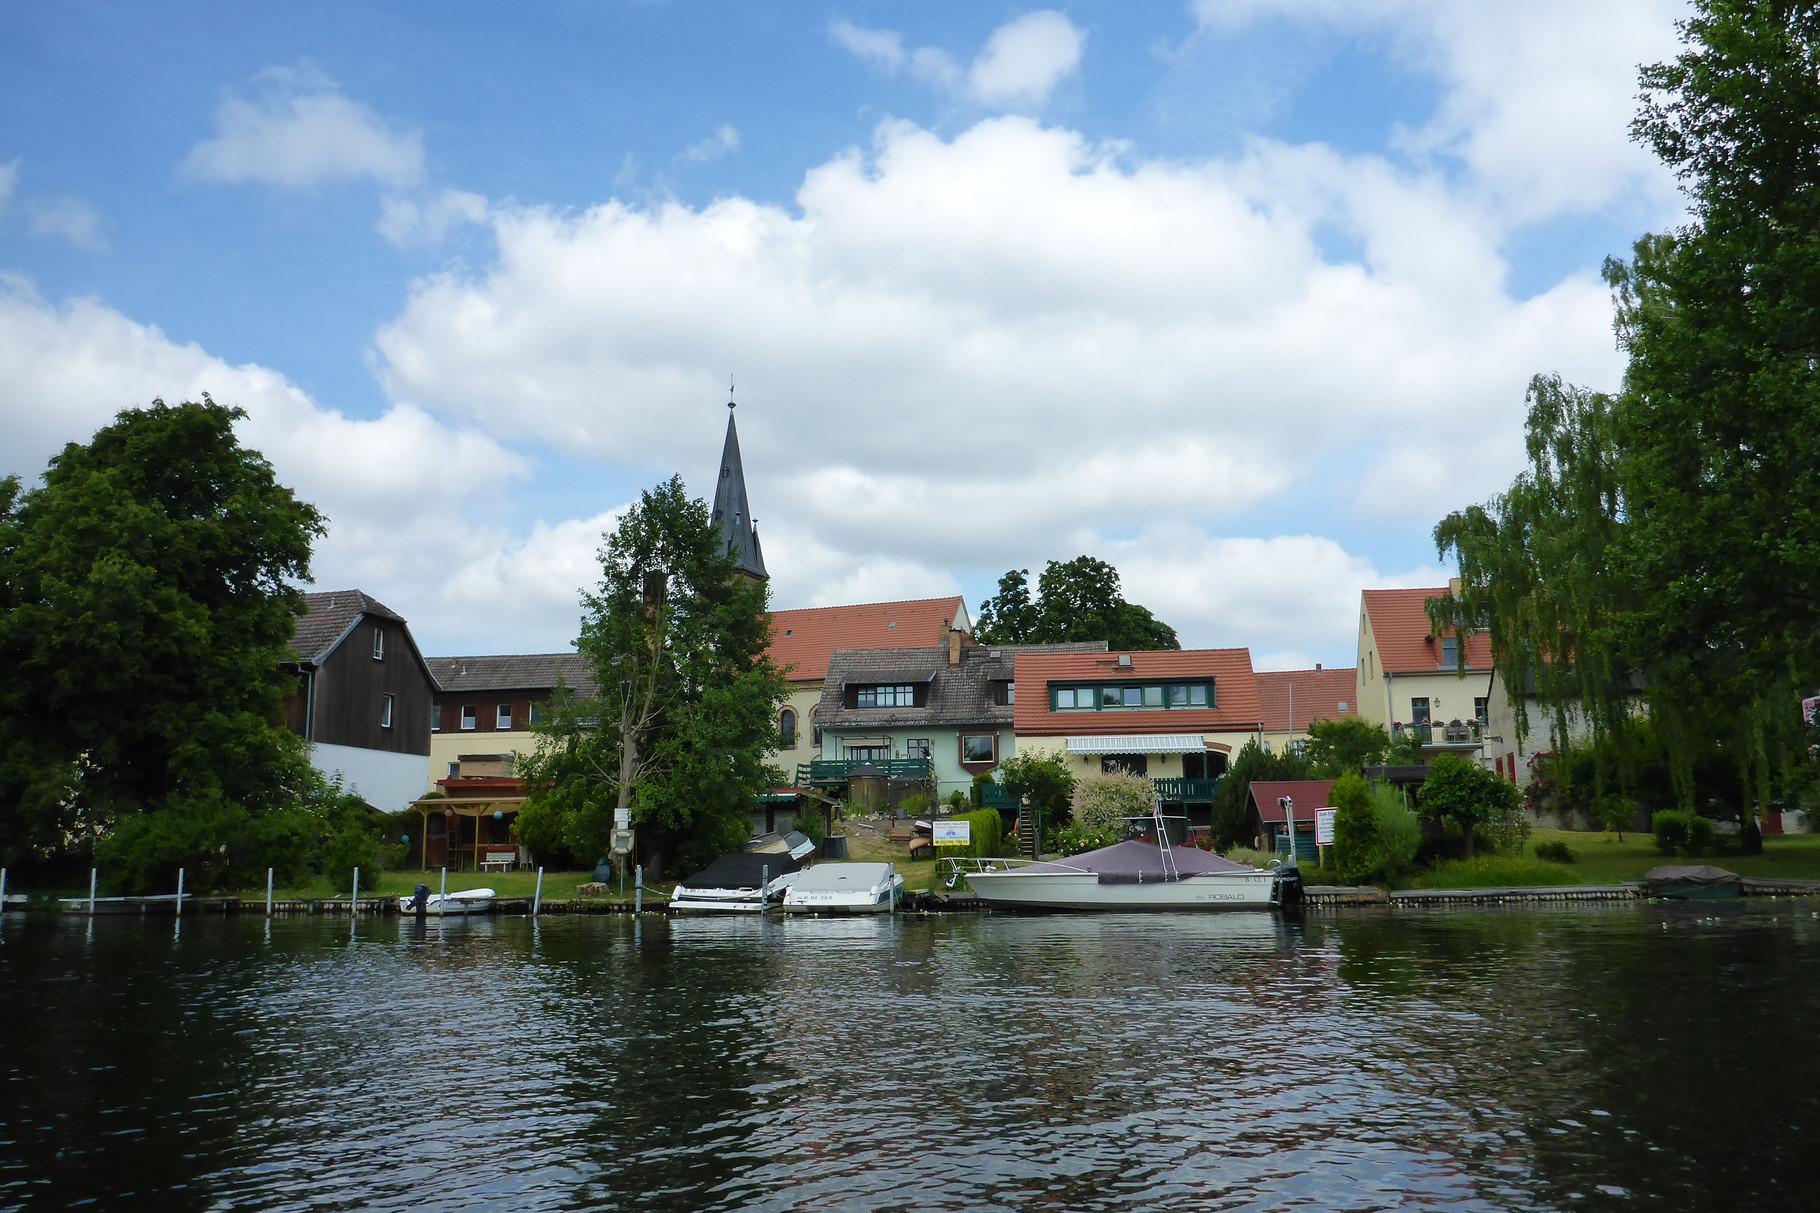 und Rahnsdorf.